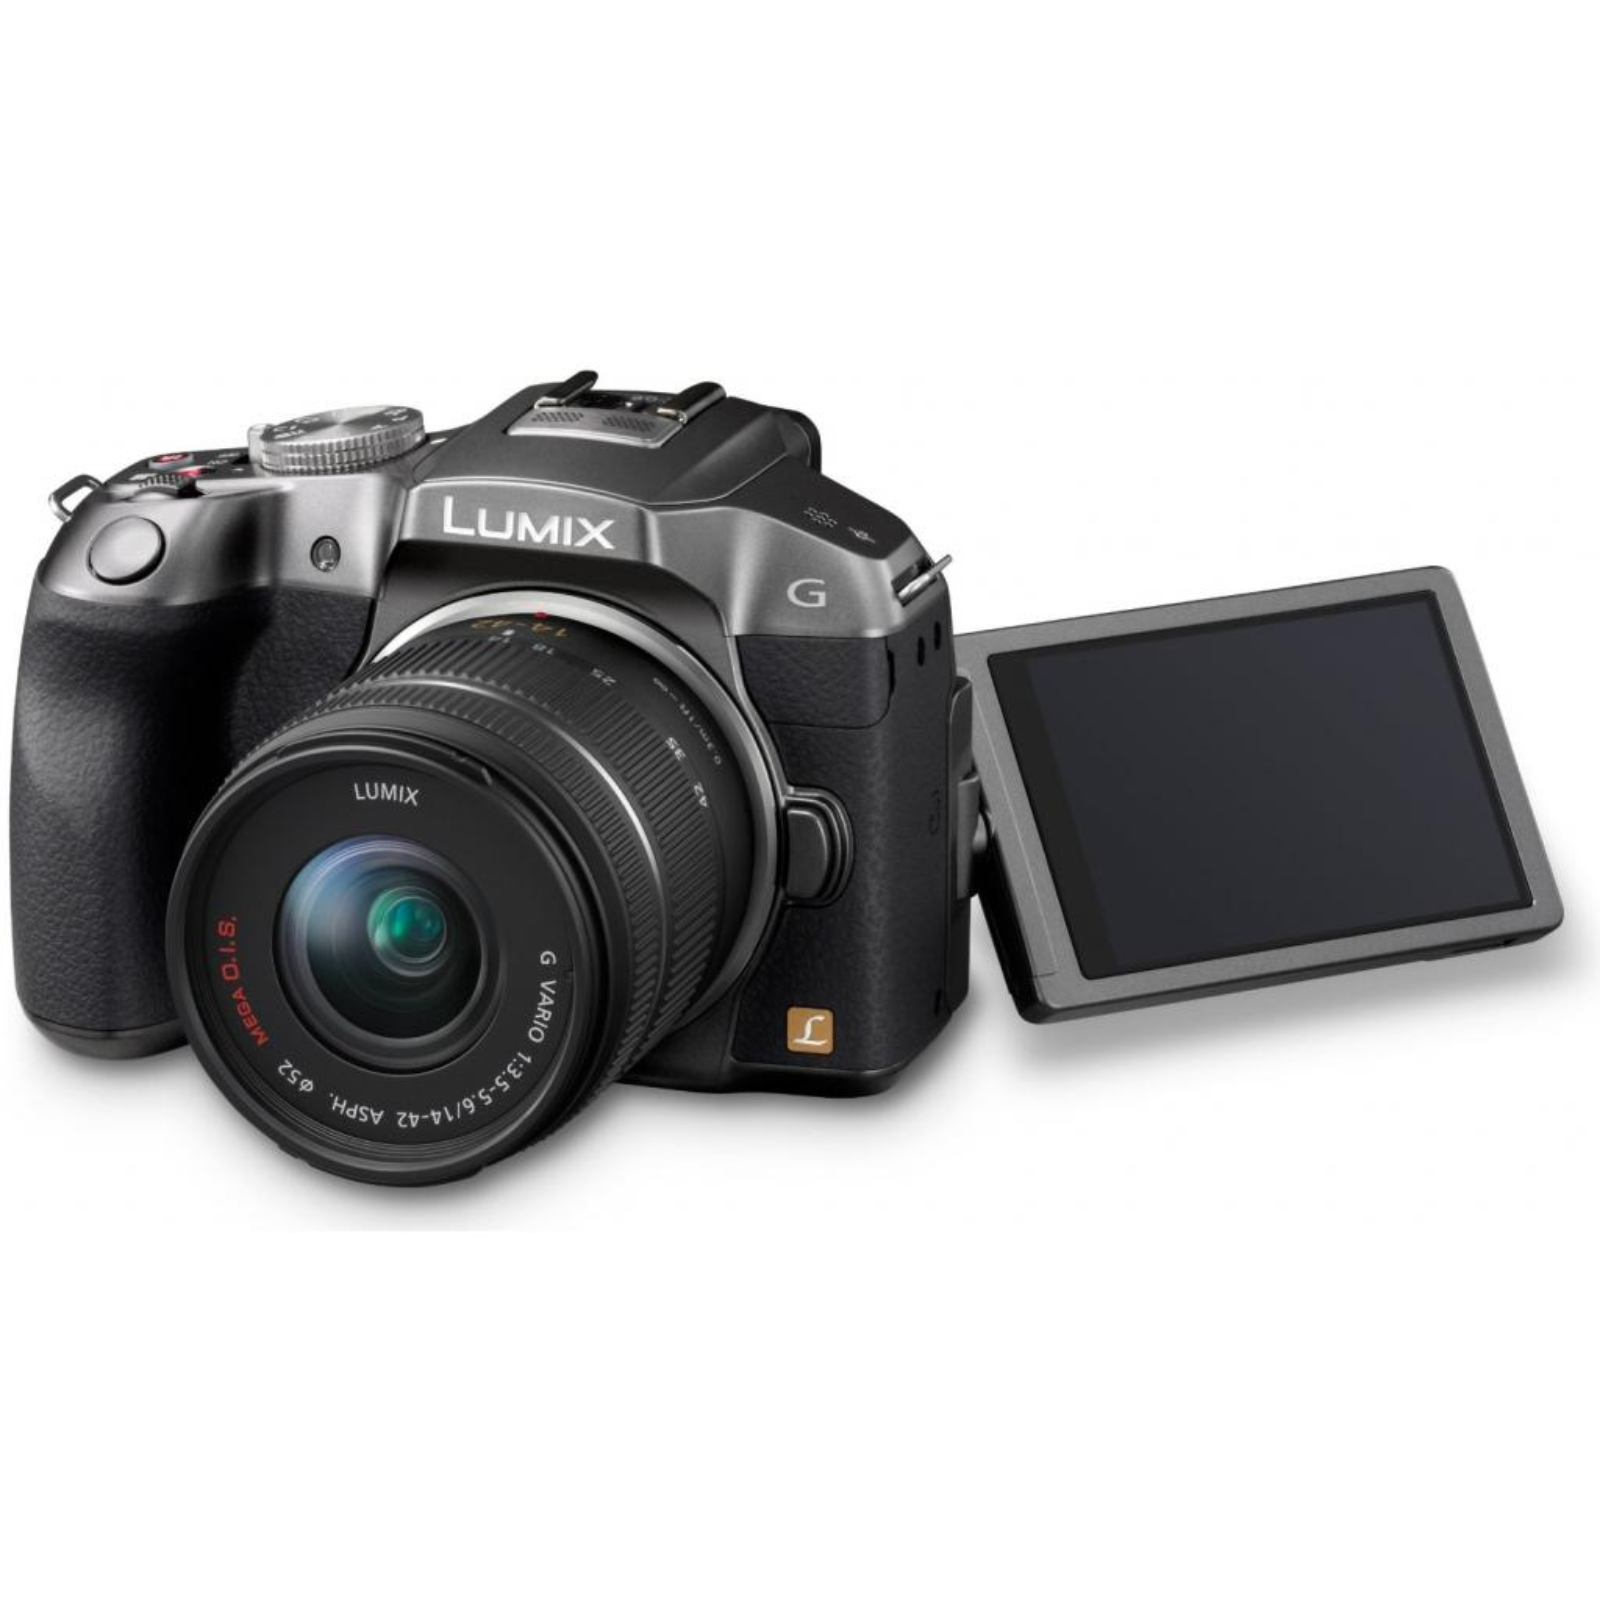 Цифровой фотоаппарат PANASONIC DMC-G6 silver 14-42 kit (DMC-G6KEE-S) изображение 4